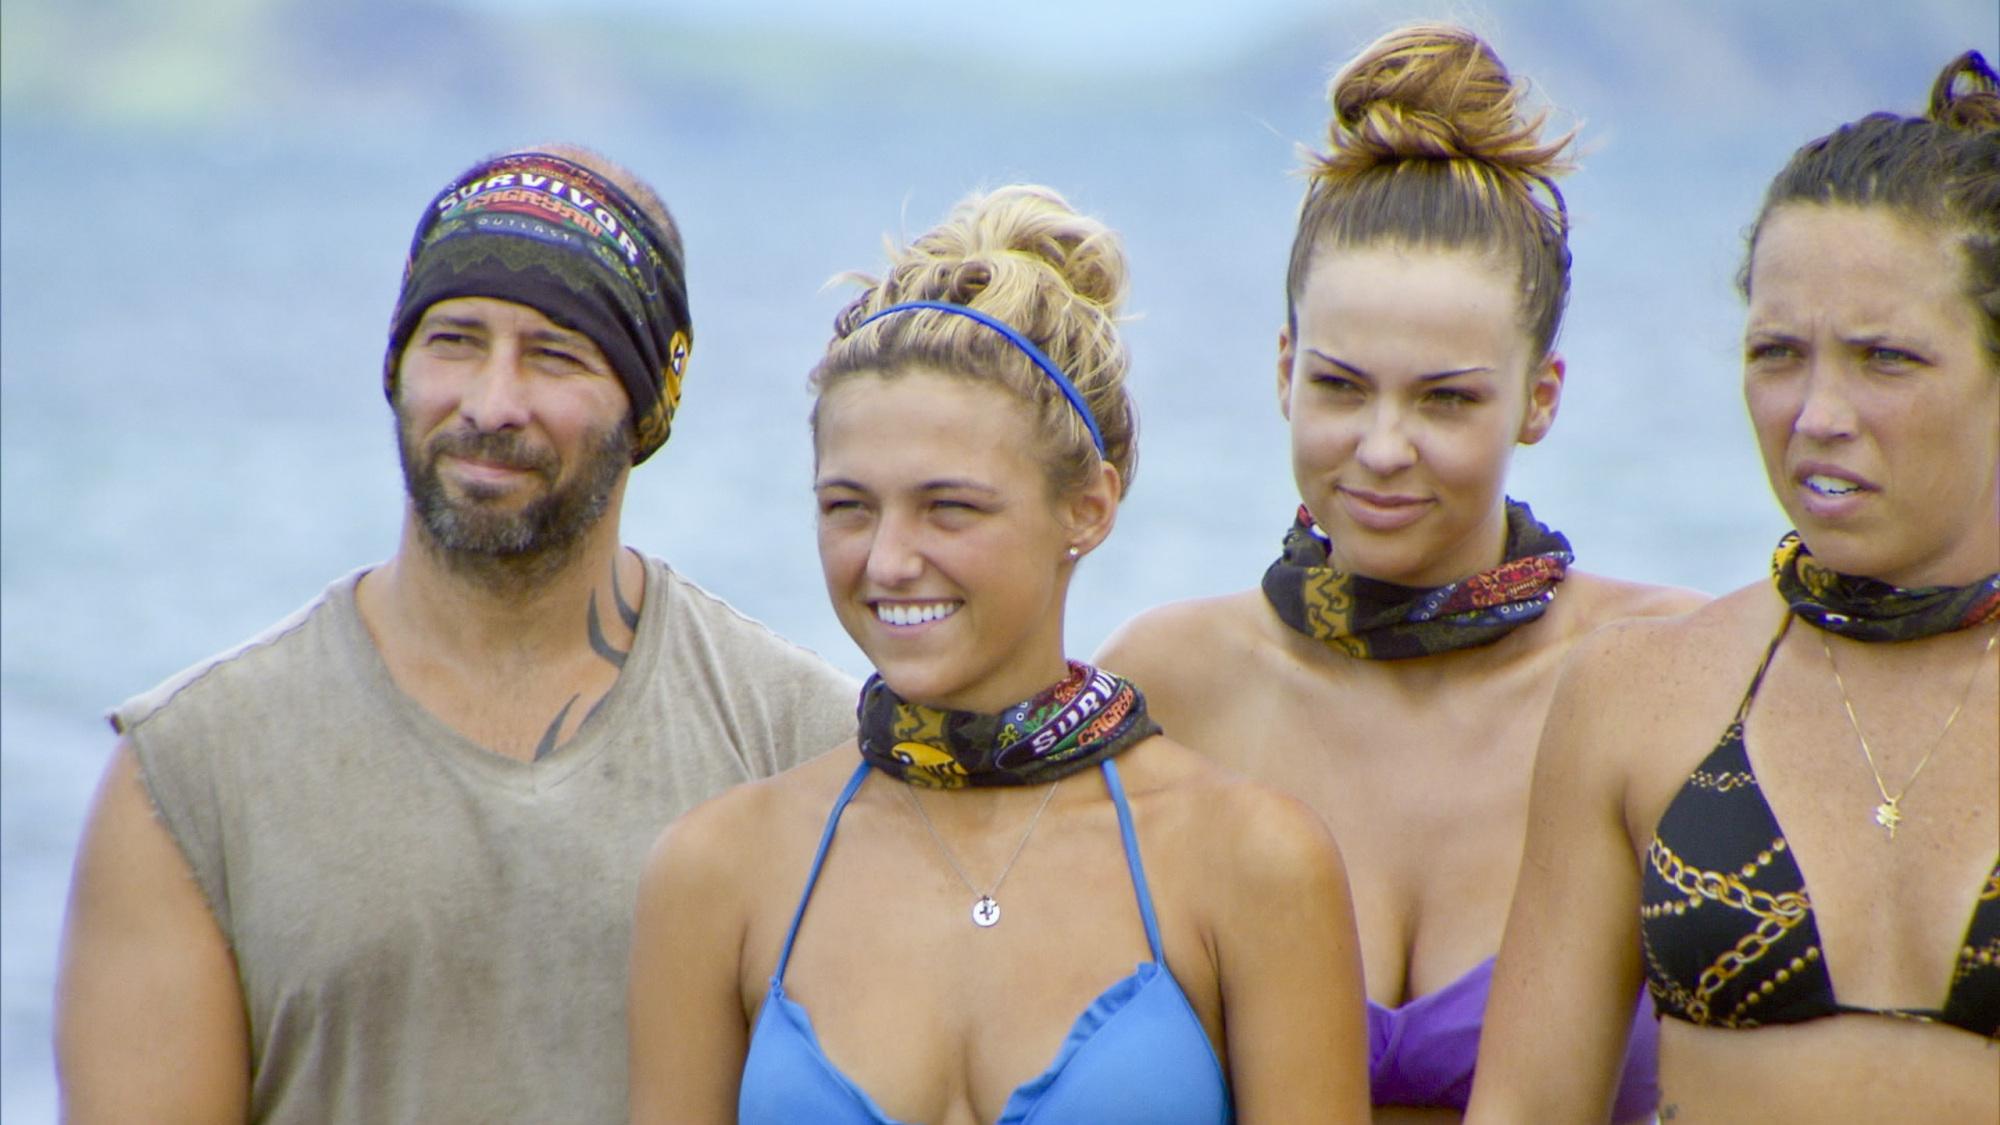 Tony, Jefra, Morgan and Sarah in Season 28 Episode 6